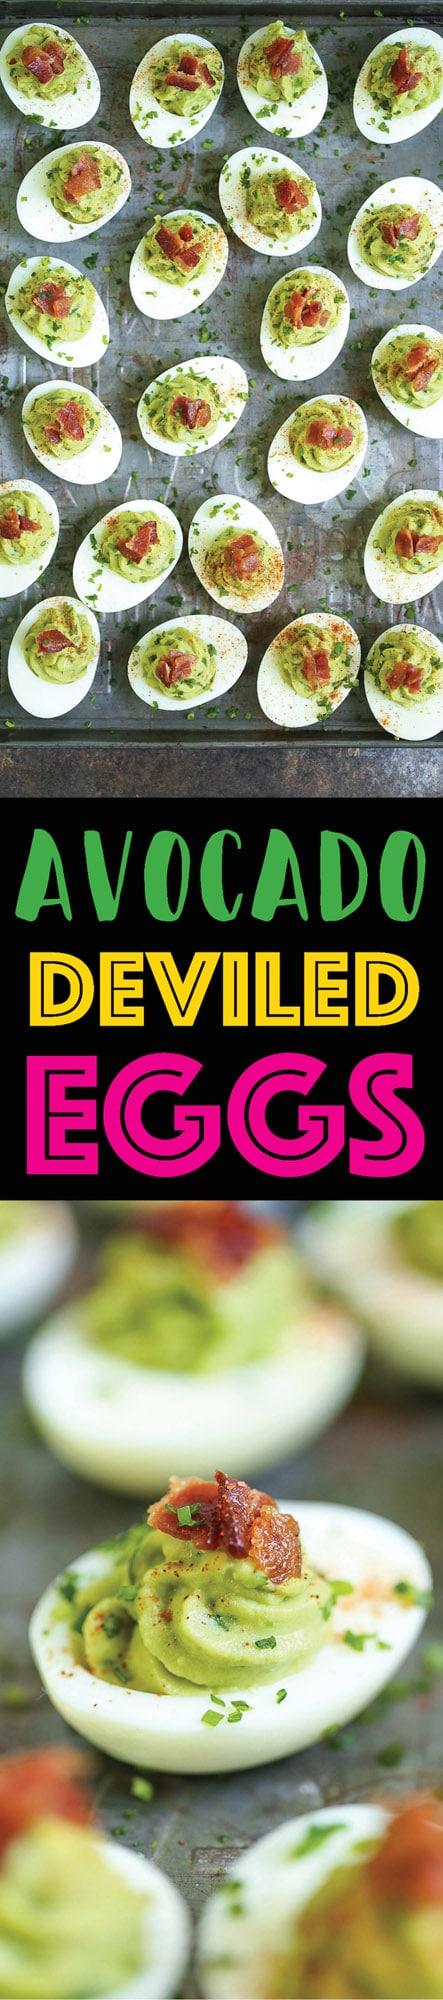 high protein deviled eggs snack recipe